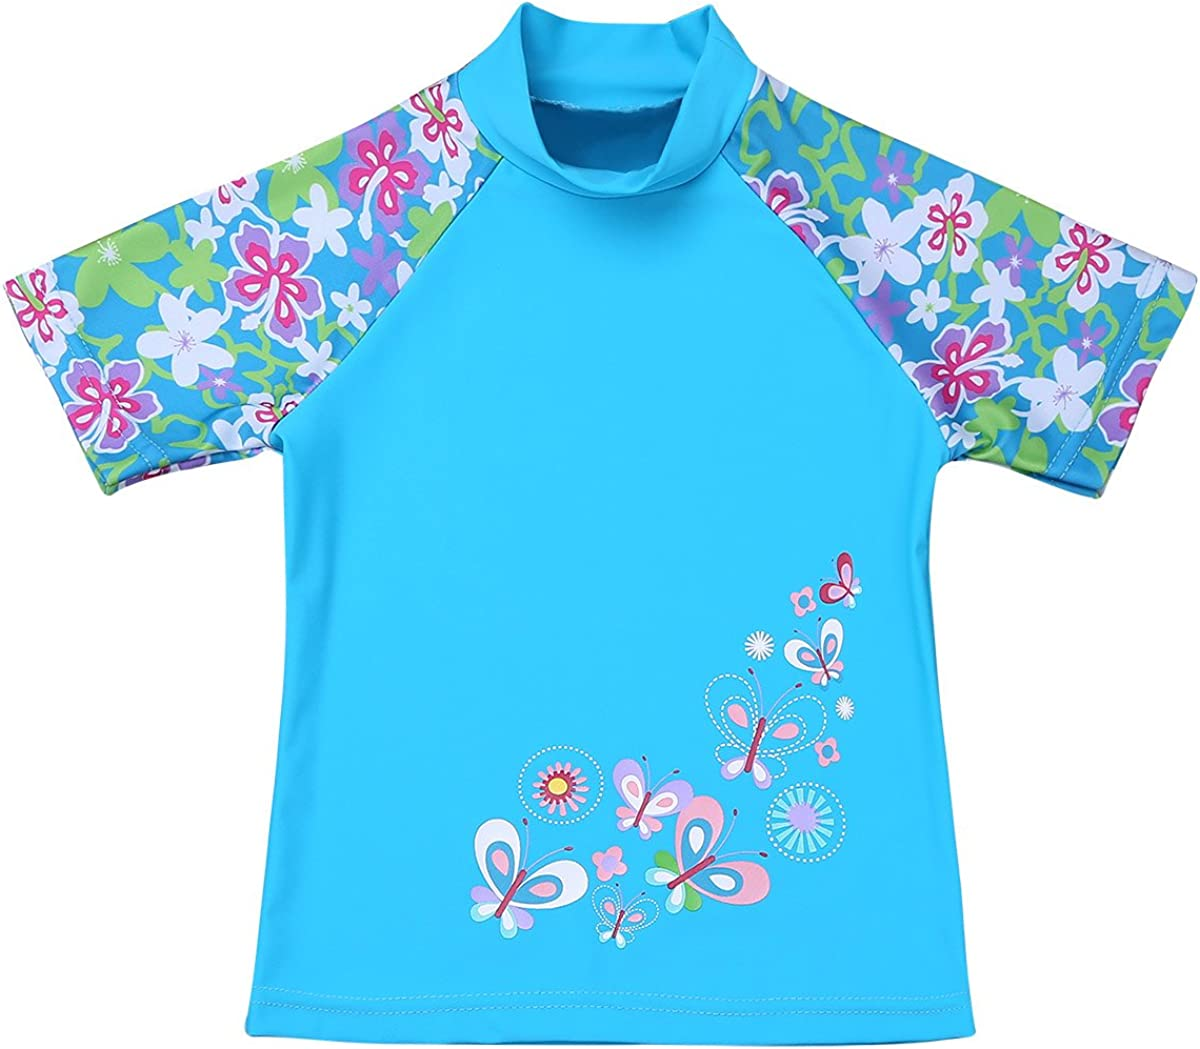 inlzdz Kids Girls Short Sleeves Floral Printed Tops with Bottoms Set Two Piece Swimwear Rash Guard Beachwear Tankini